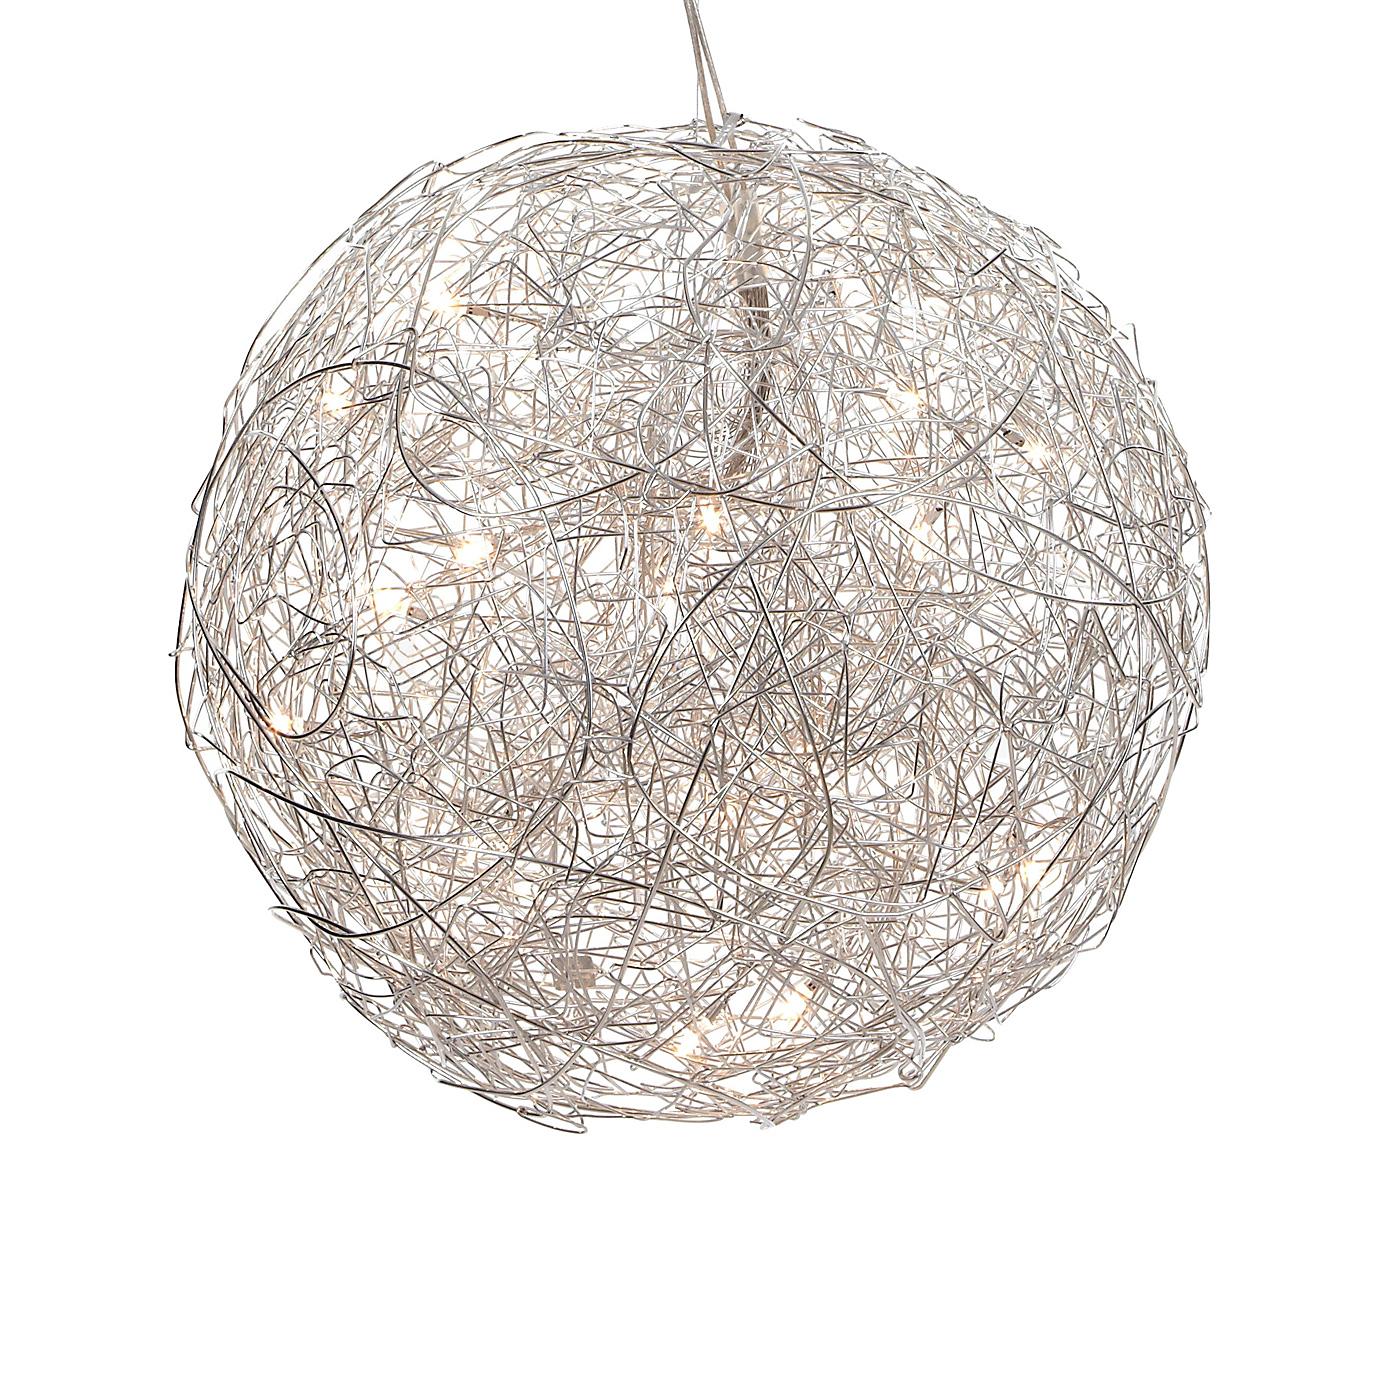 catellani smith fil de fer sospensione commutable suspensions lampes luminaires. Black Bedroom Furniture Sets. Home Design Ideas